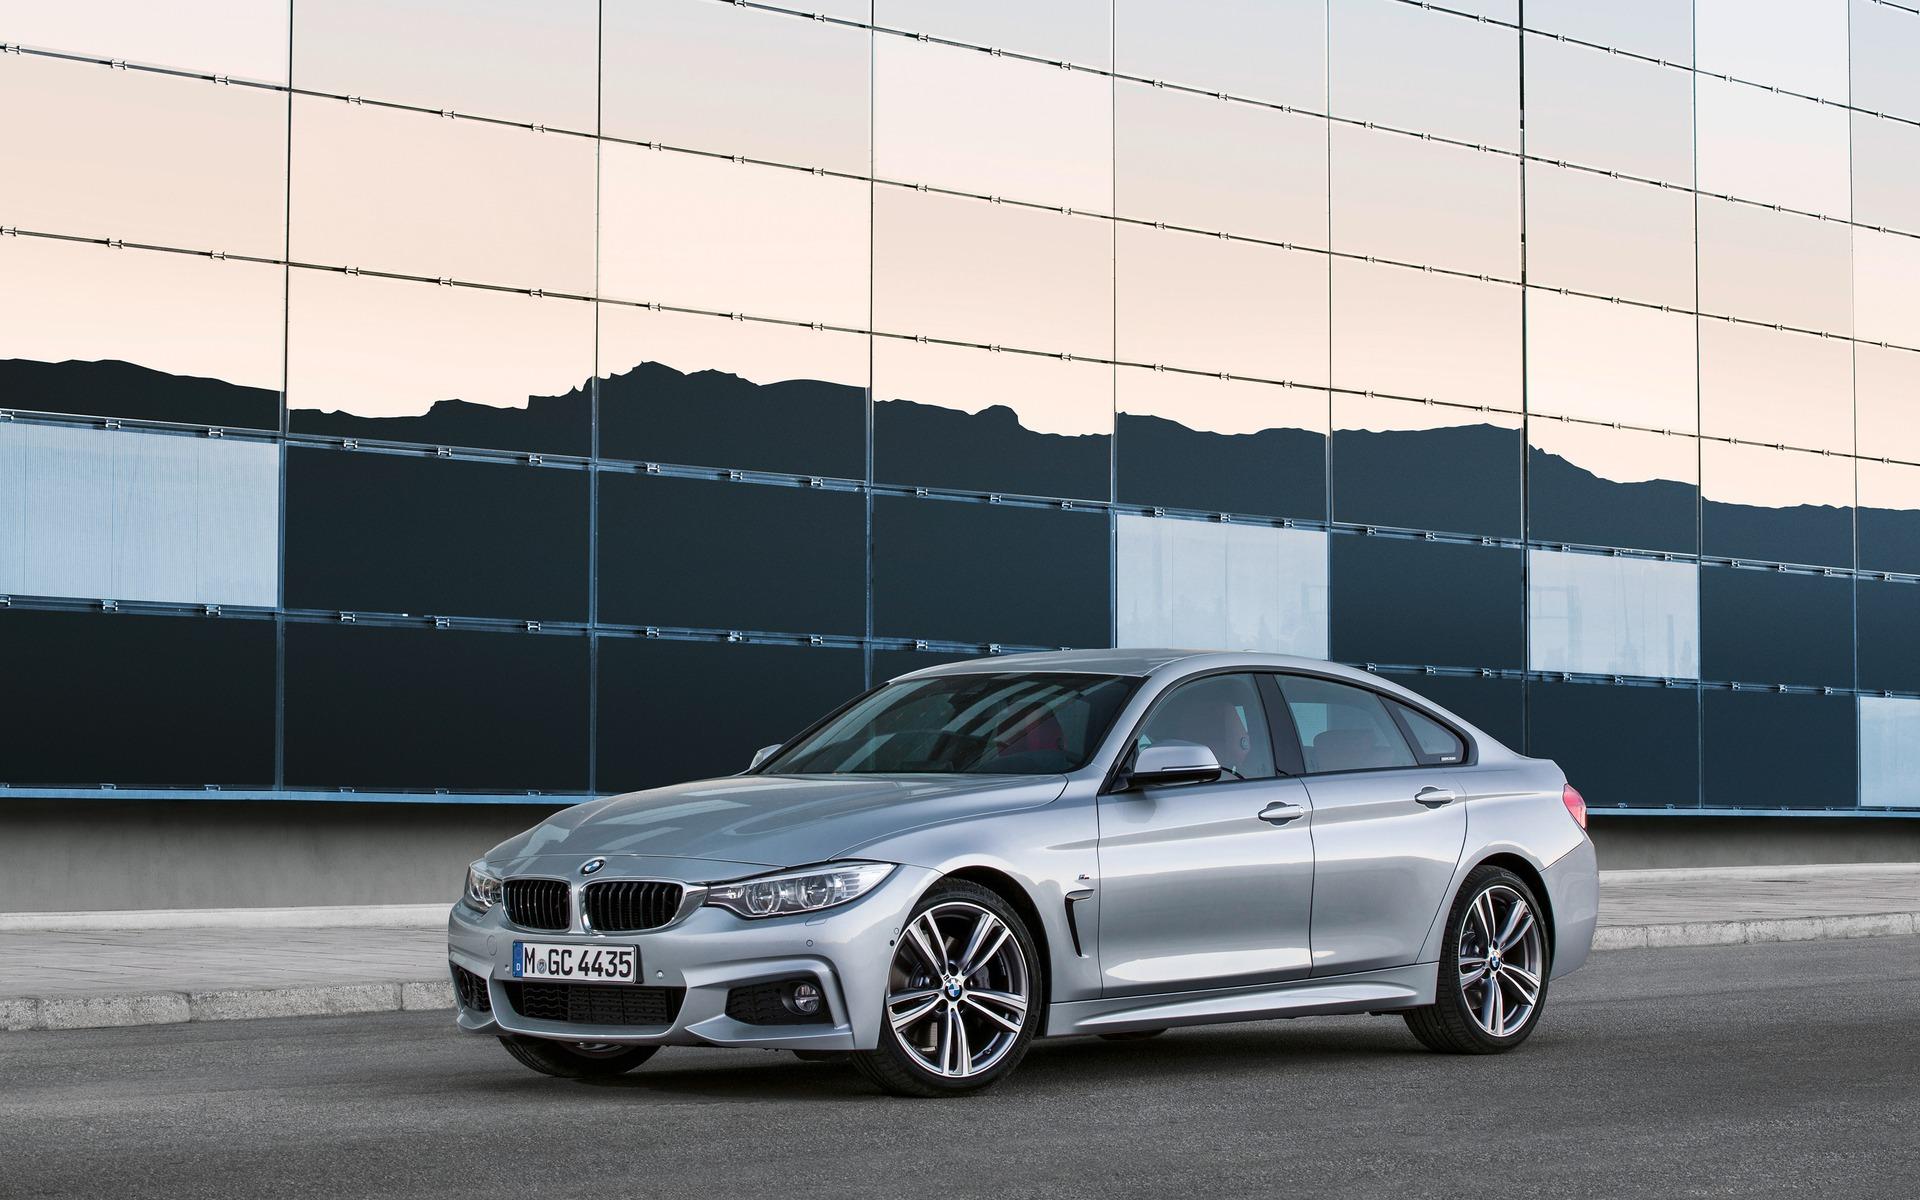 2015 BMW 4 Series Gran Coupe.